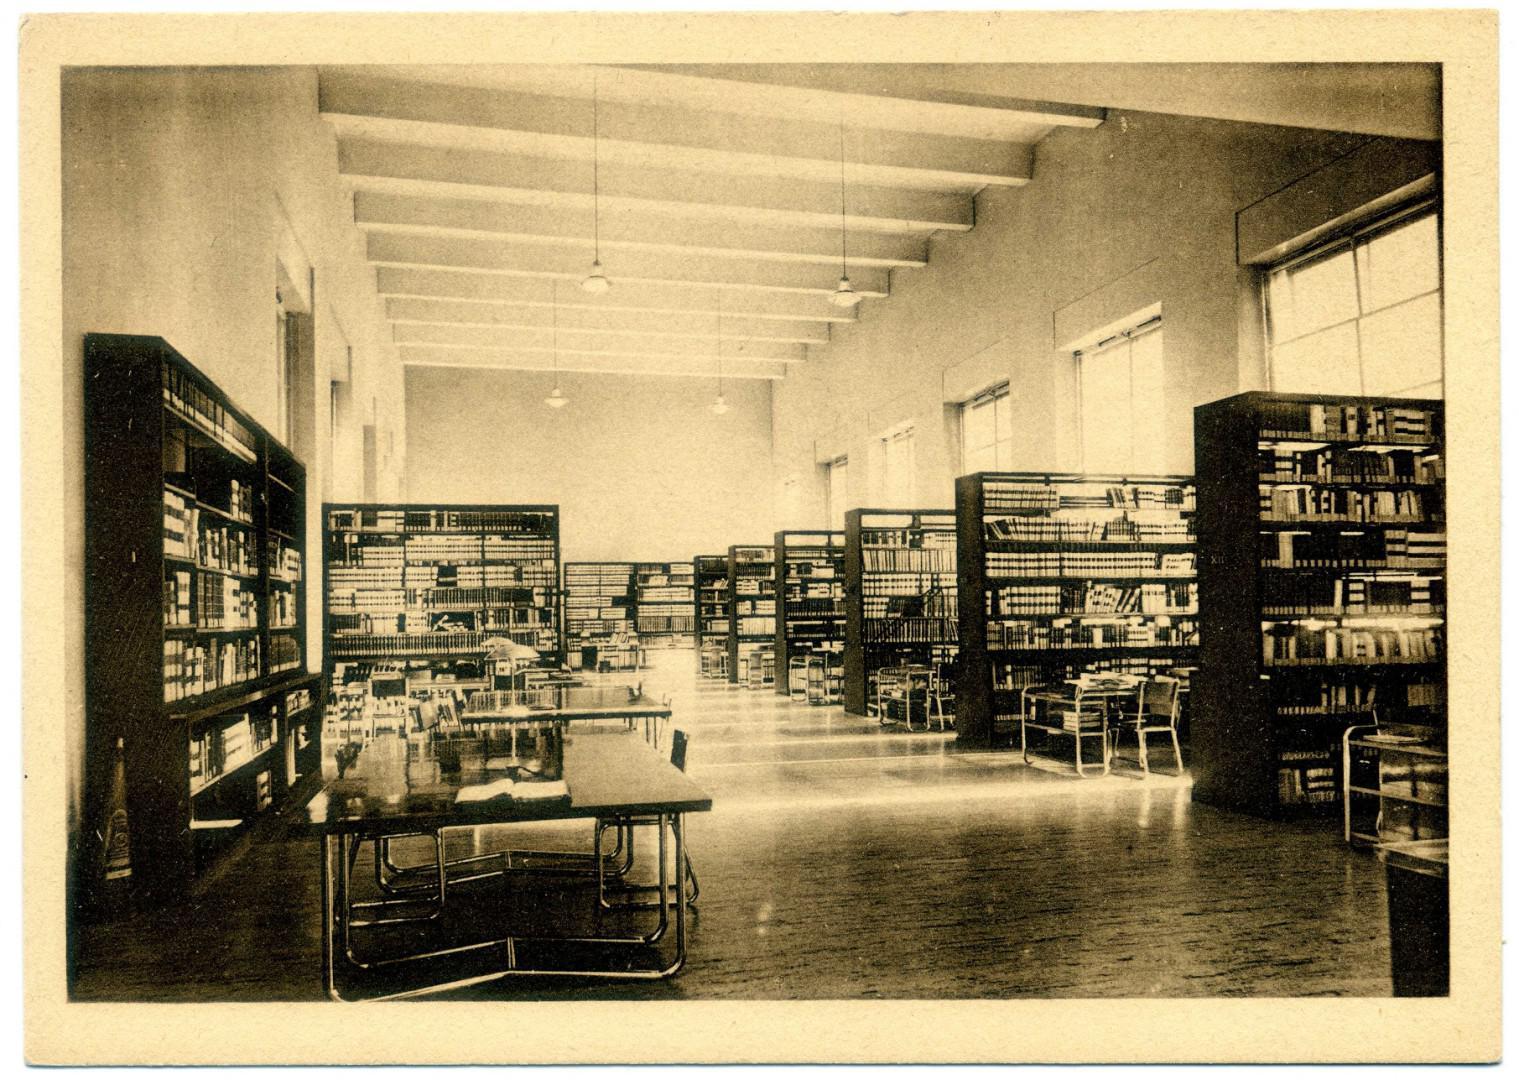 Rom: Universitätsbibliothek (Biblioteca Universitaria Alessandrina)